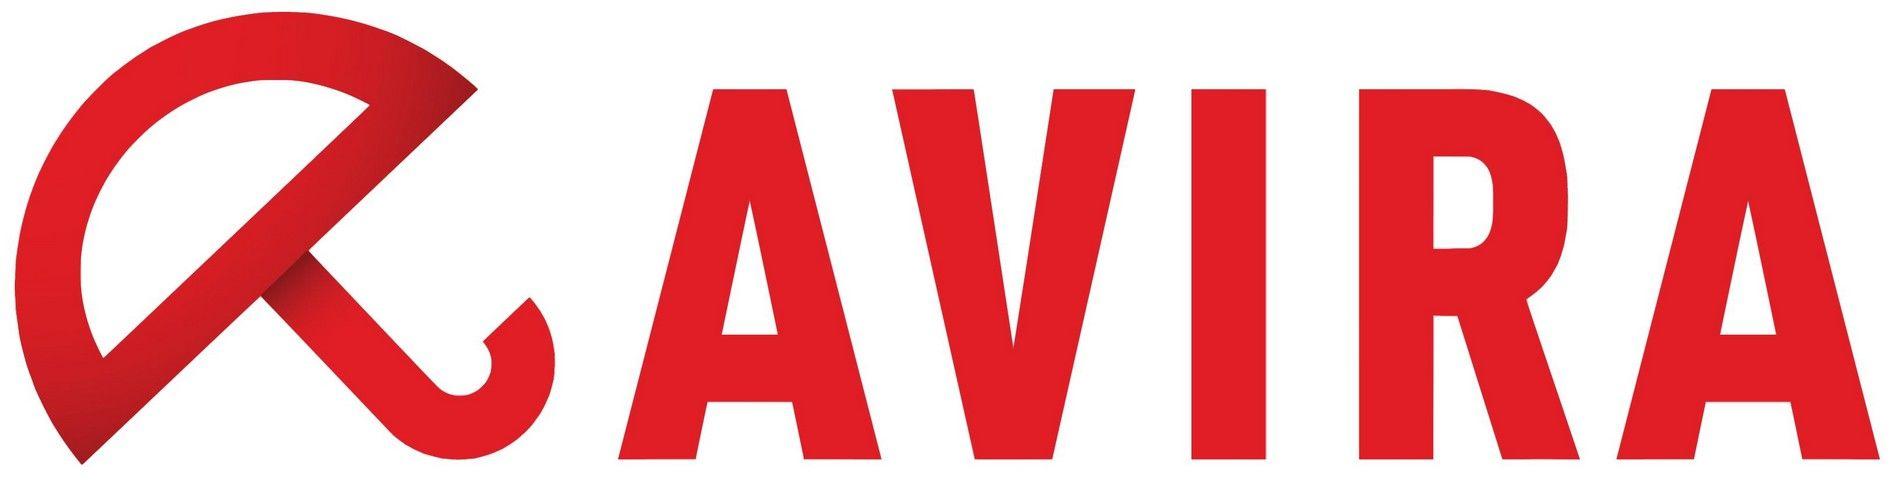 Avira Logo [EPS File] Vector EPS Free Download, Logo, Icons, Brand Emblems